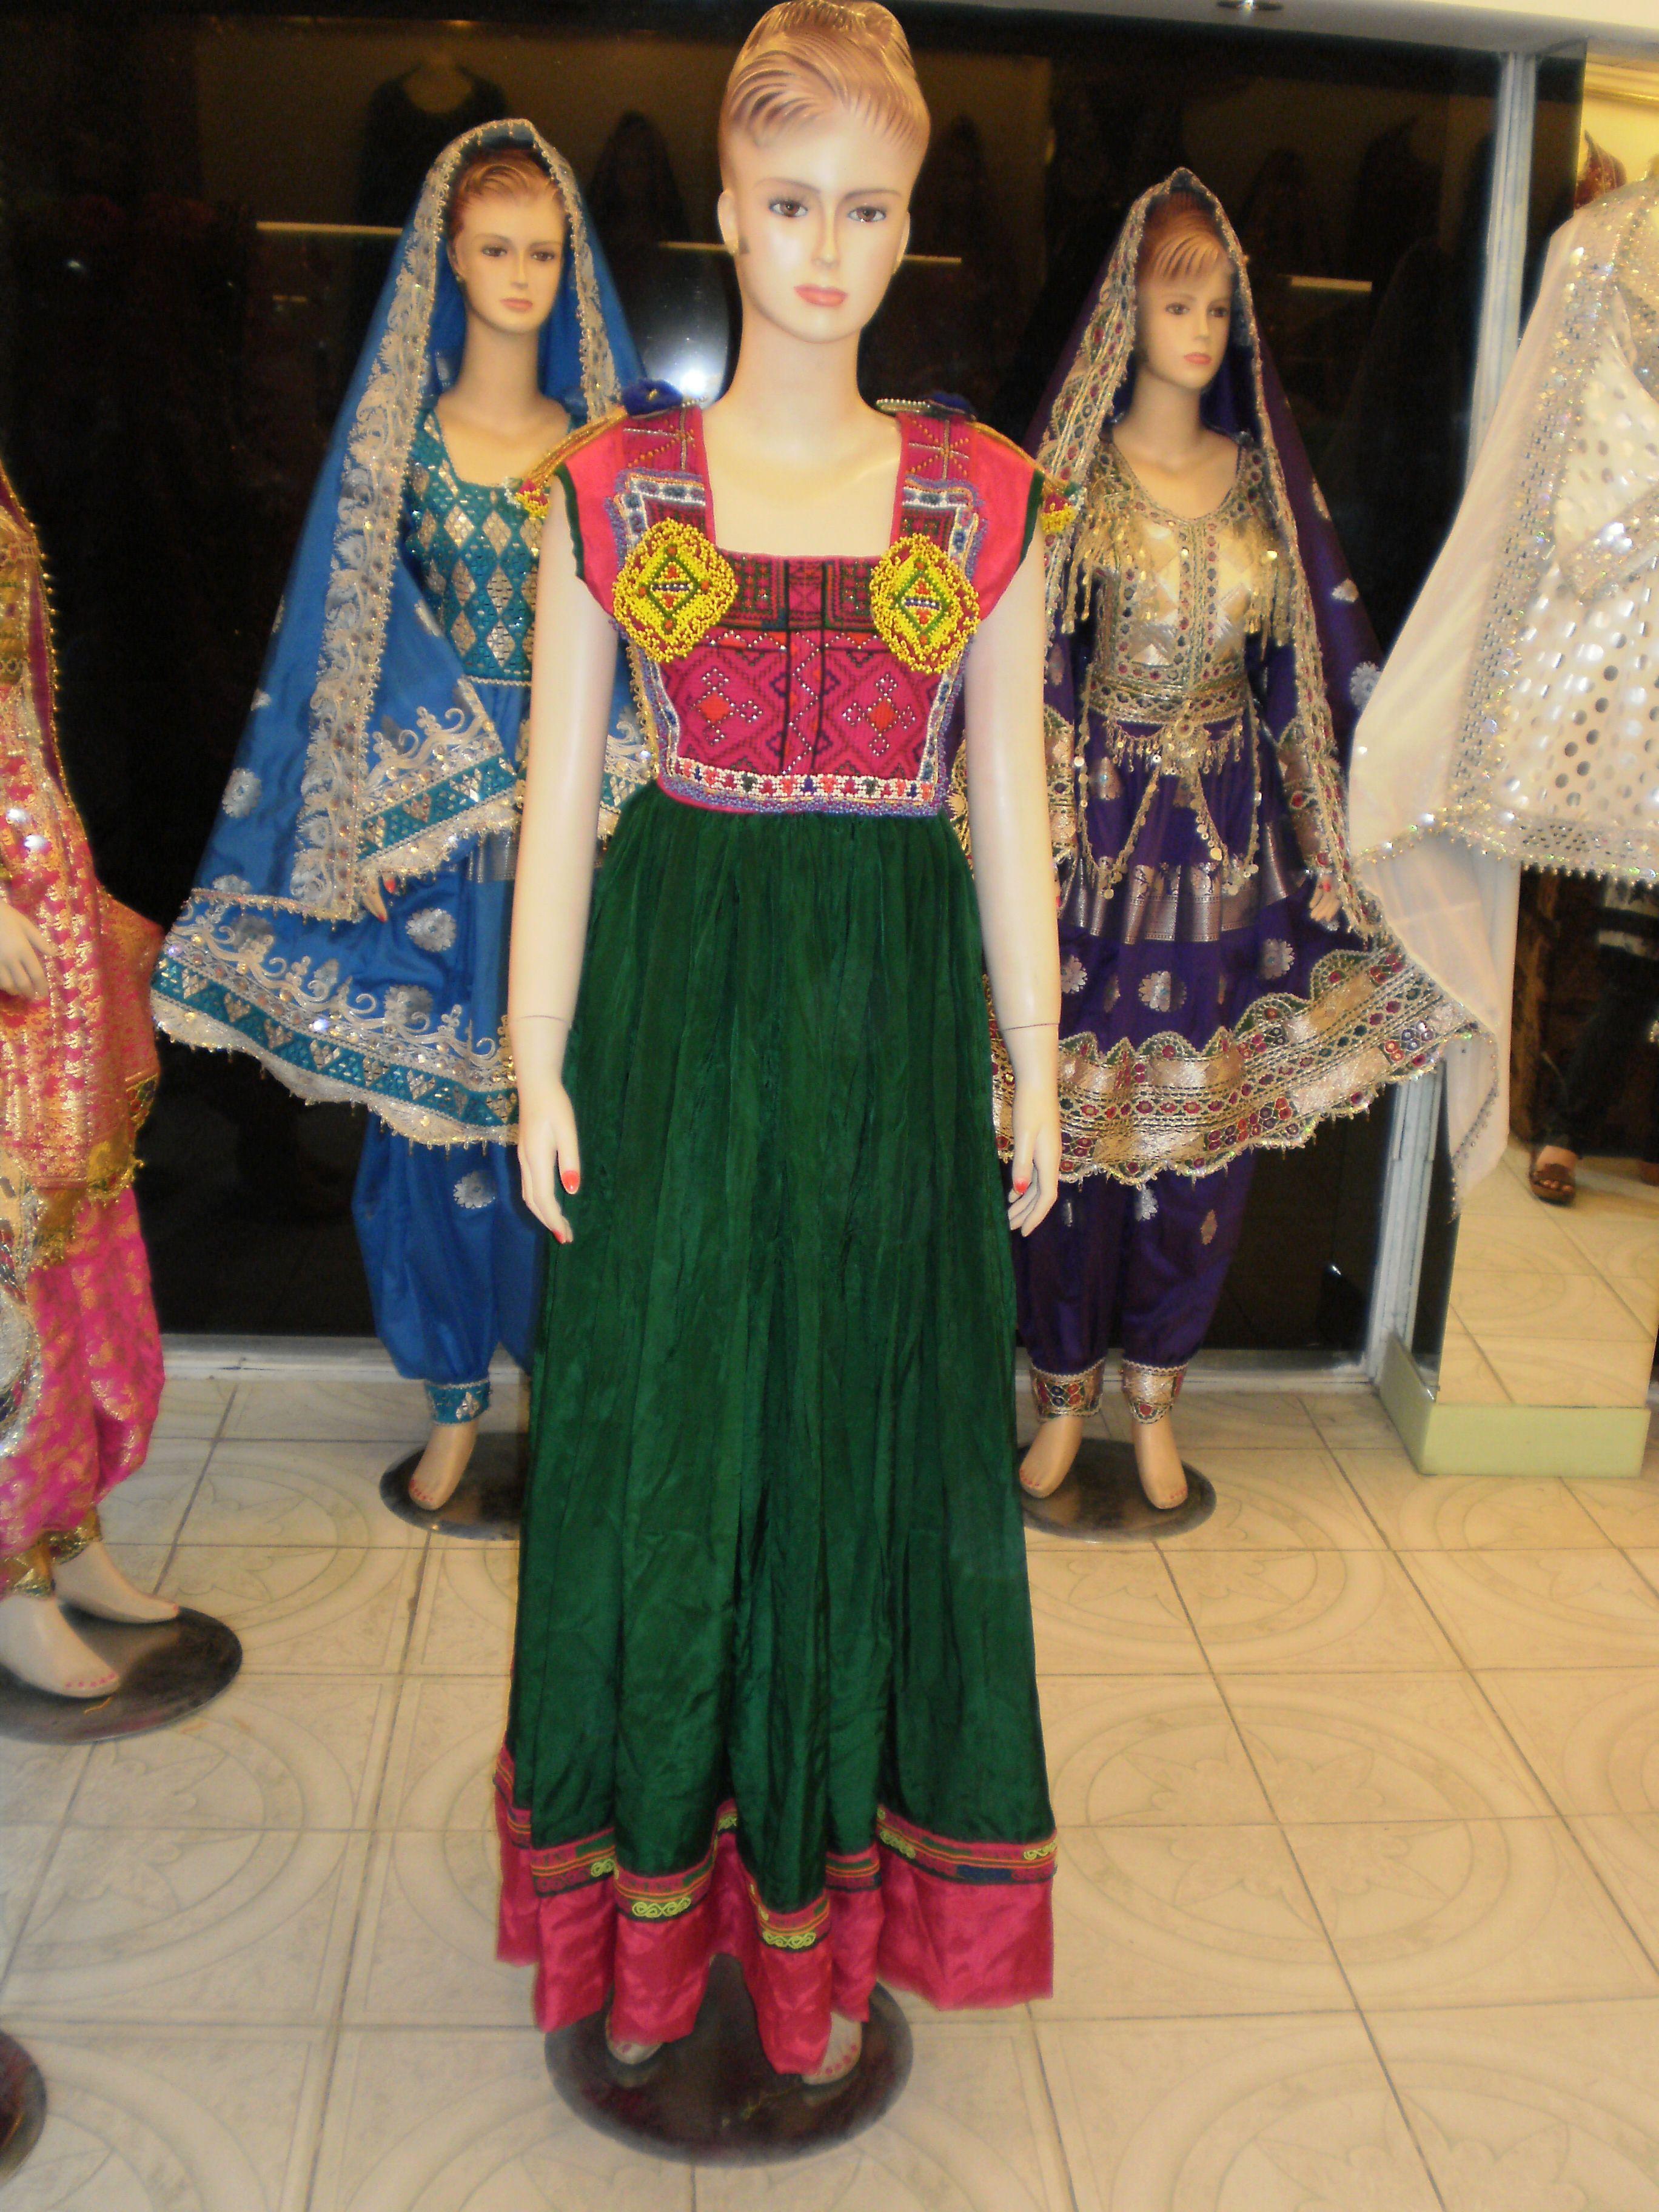 Amazing Taliban Women Dress Code A Woman Wearing A Headscarf